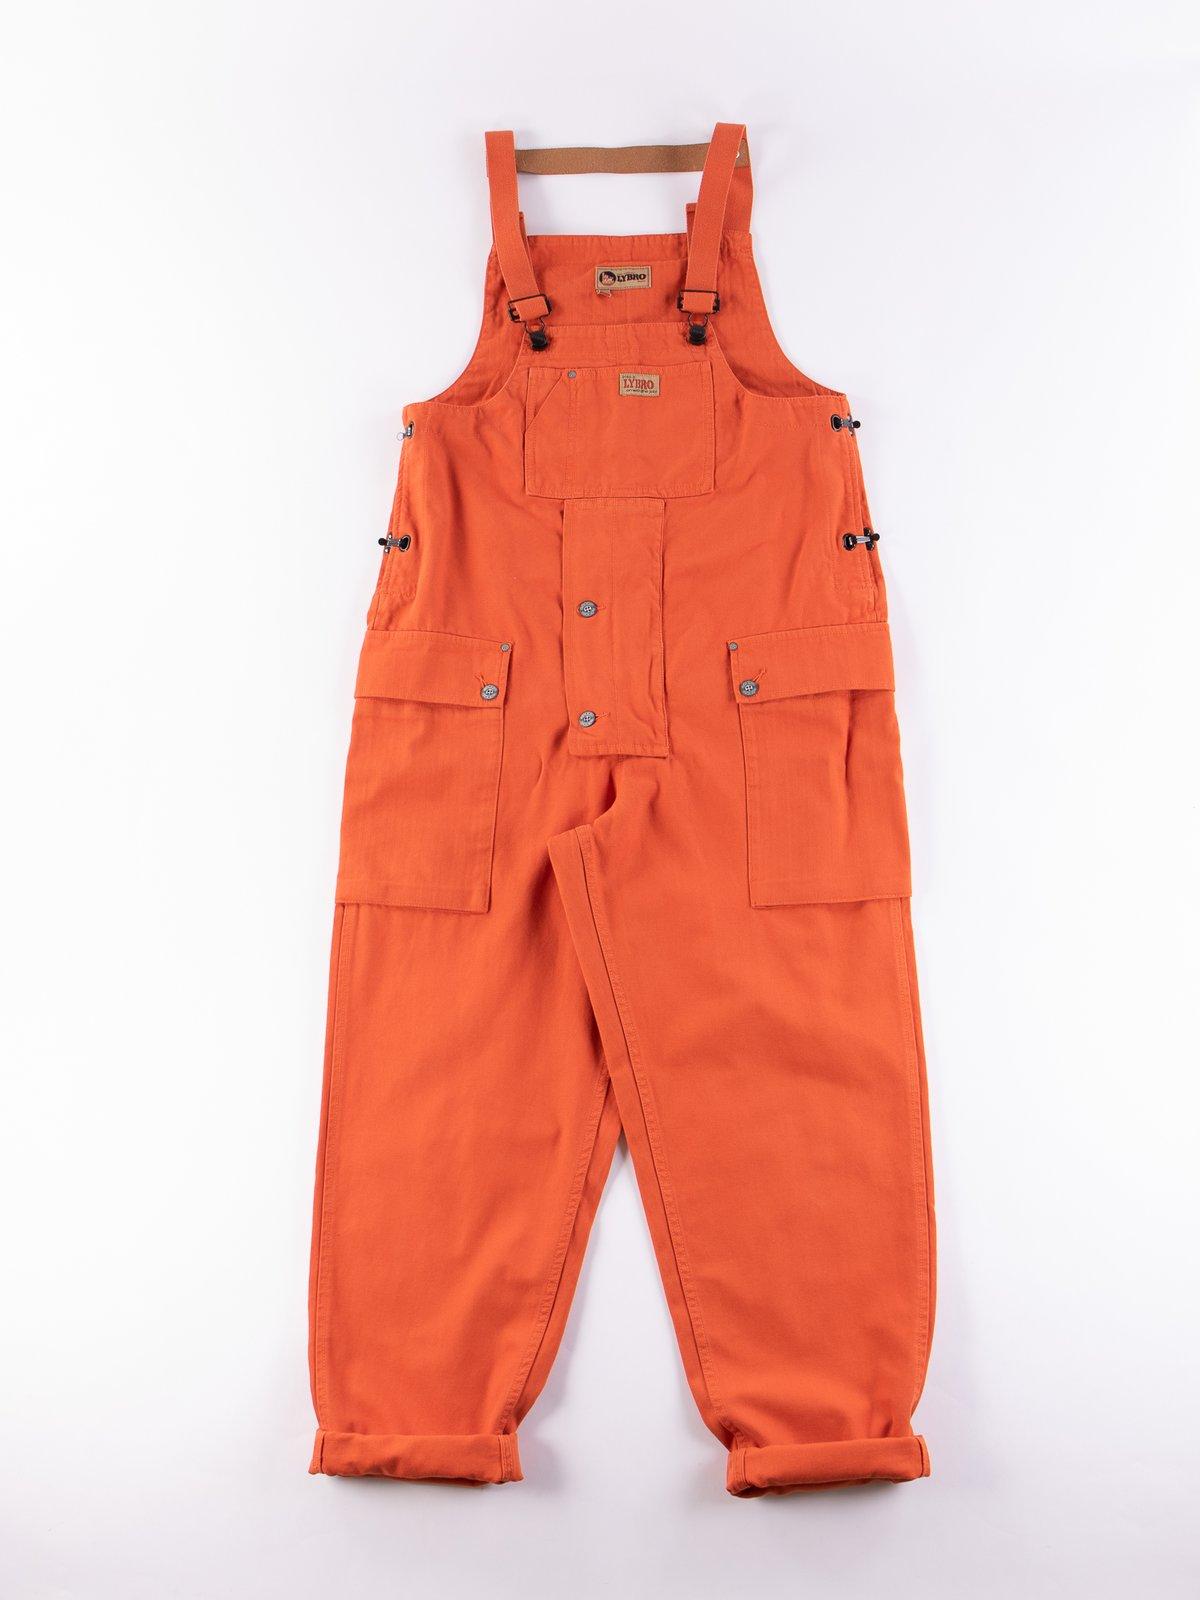 Lybro Vintage Orange Naval Dungaree - Image 1